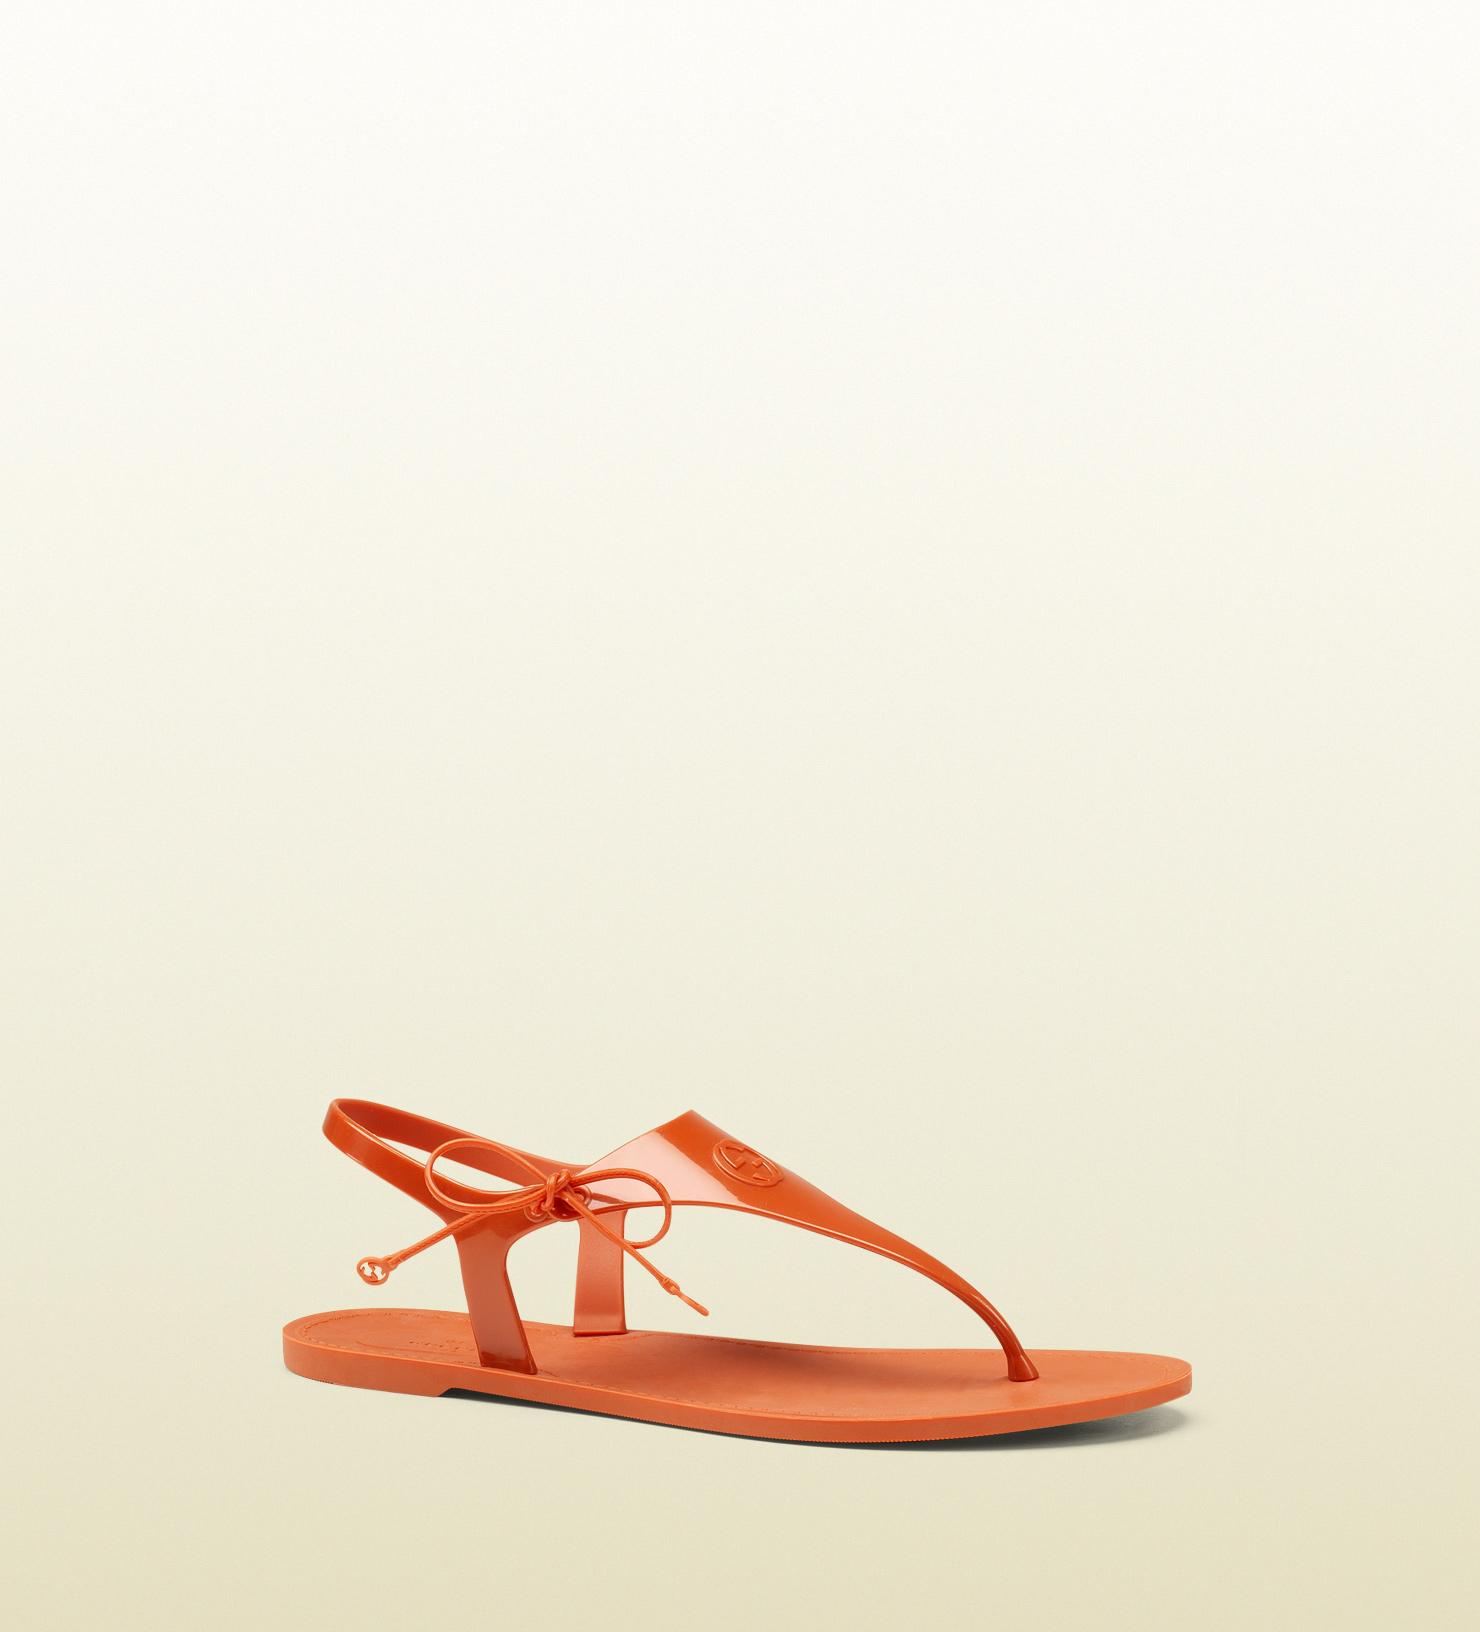 66359ec6b6f9 Lyst - Gucci Katina Bioplastic Rubber Thong Sandal in Orange